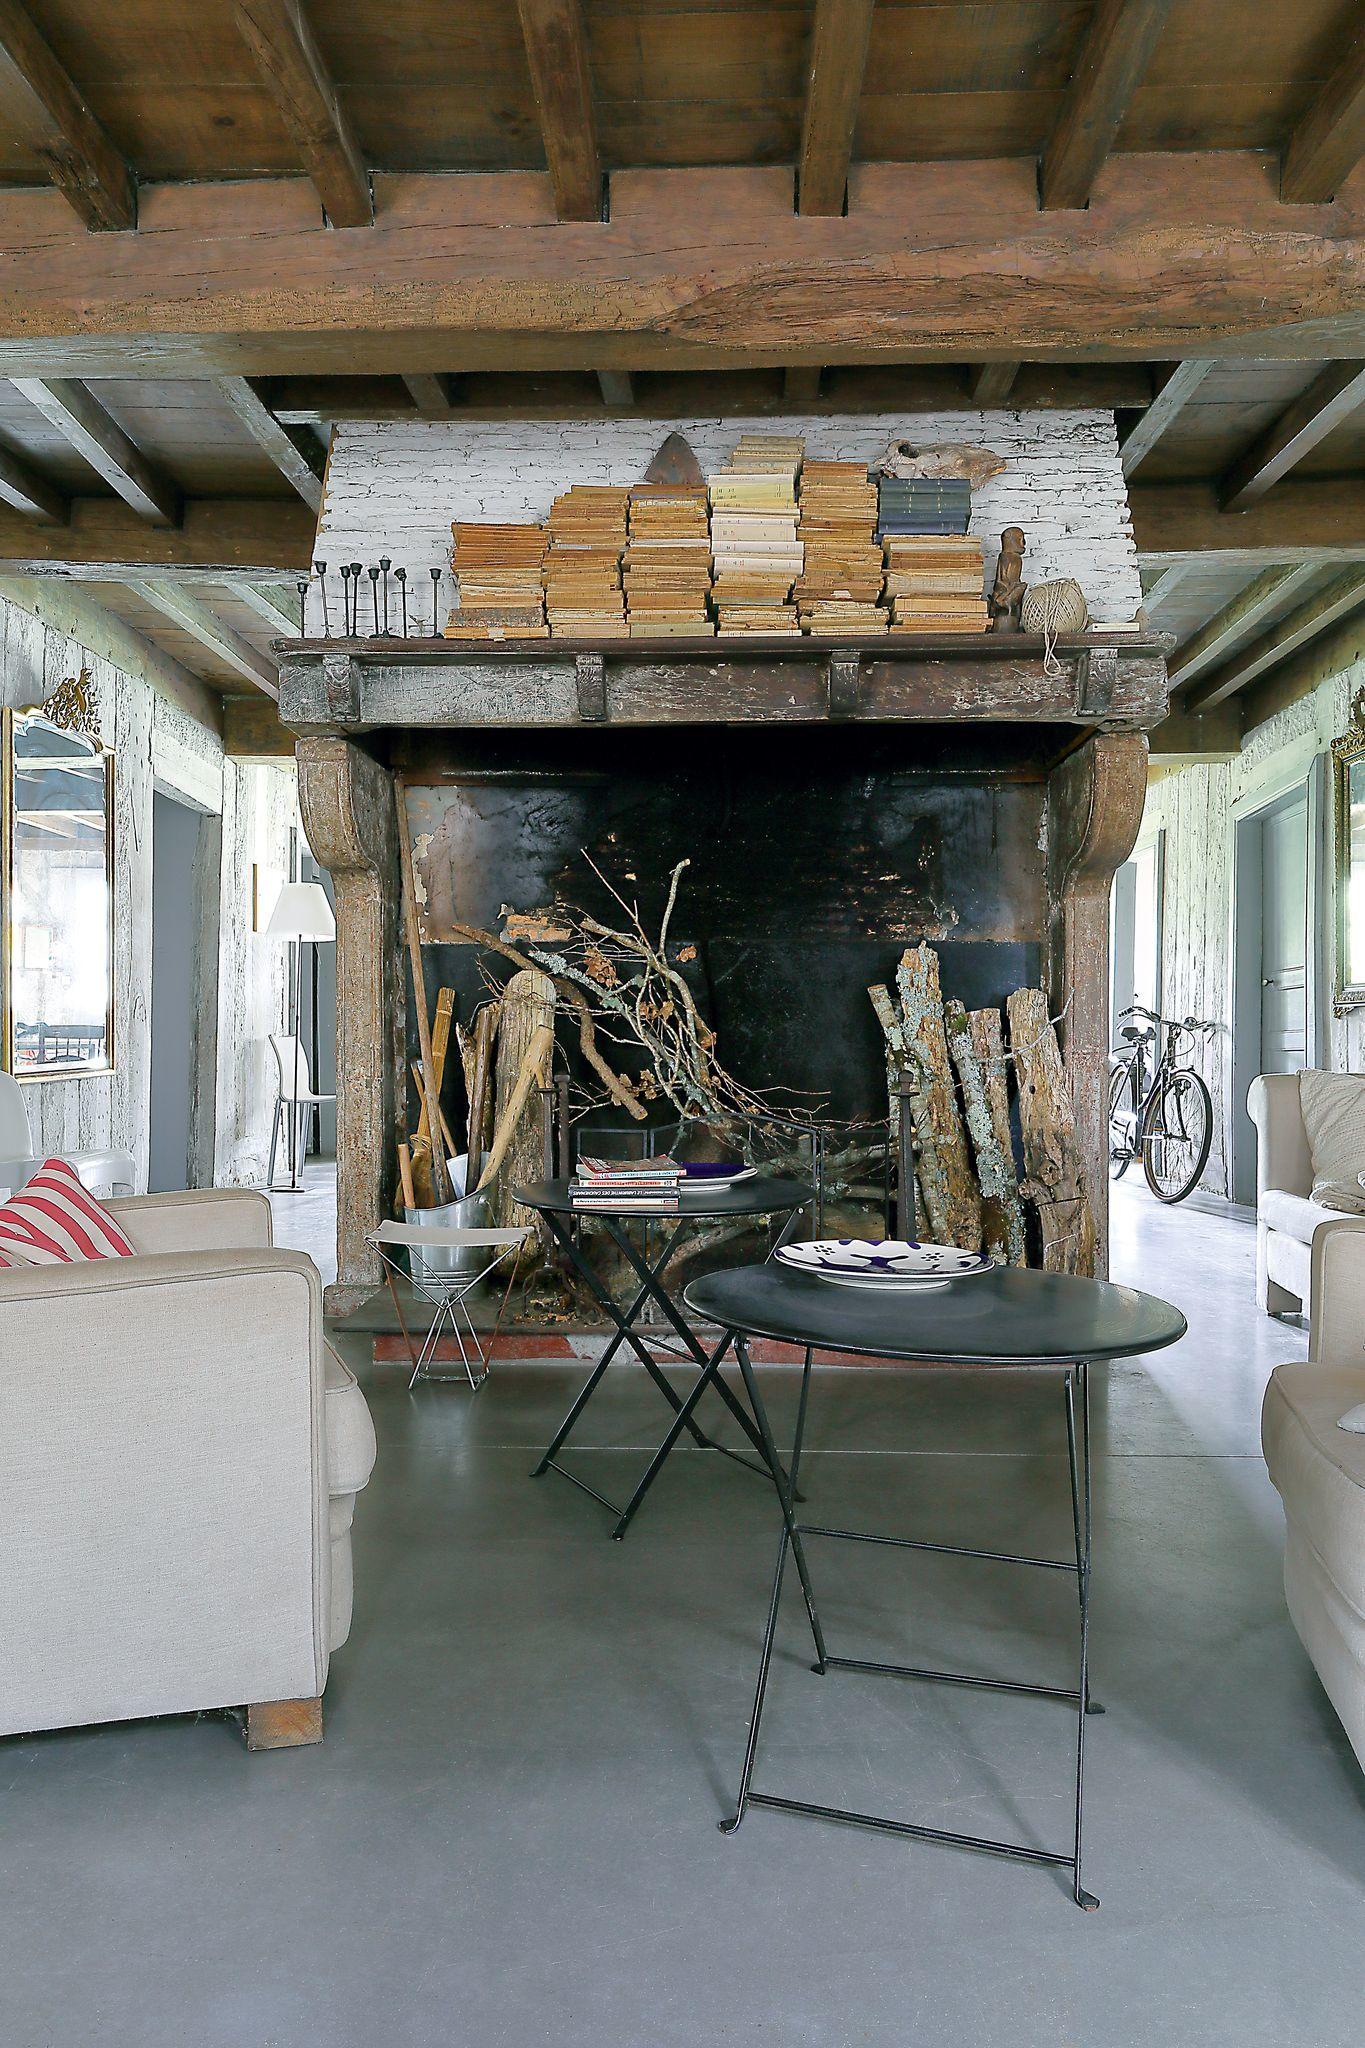 une-cheminee-depoque-vient-structurer-lespace_6097958